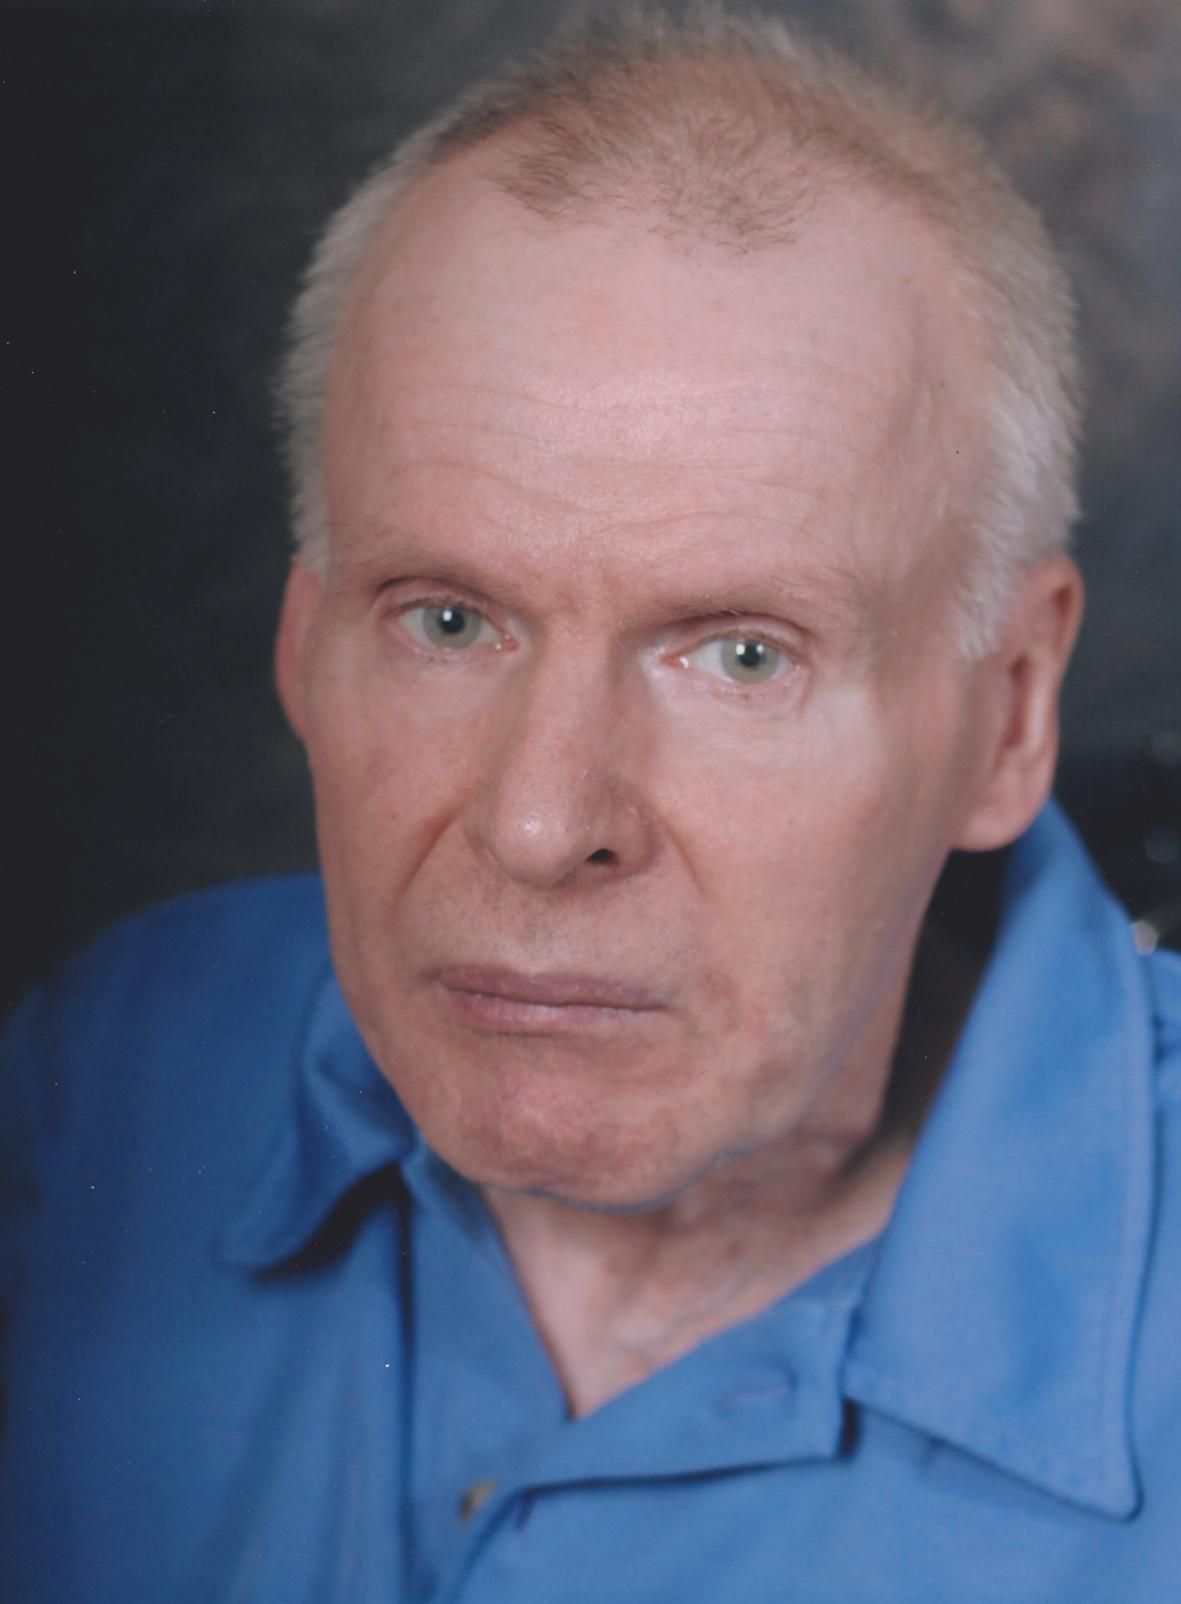 Jean-Noël Bélanger